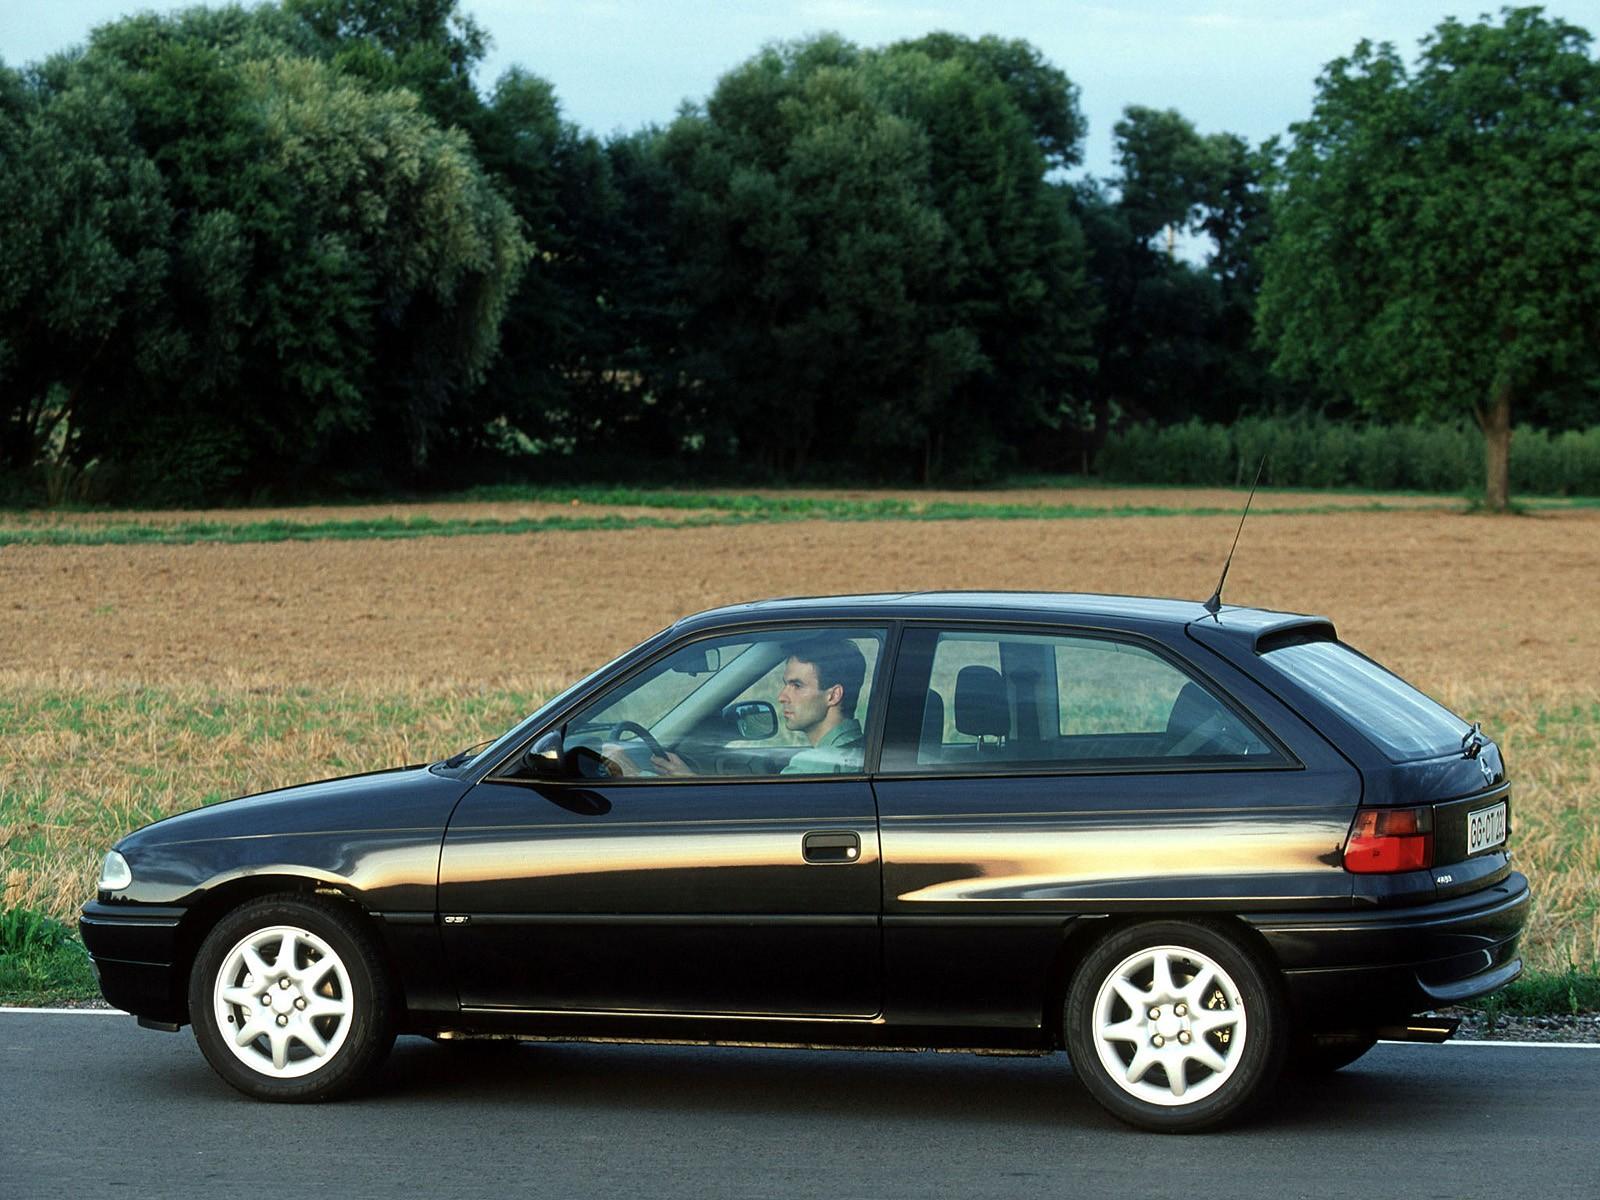 opel astra 3 doors 1991 1992 1993 1994 autoevolution. Black Bedroom Furniture Sets. Home Design Ideas